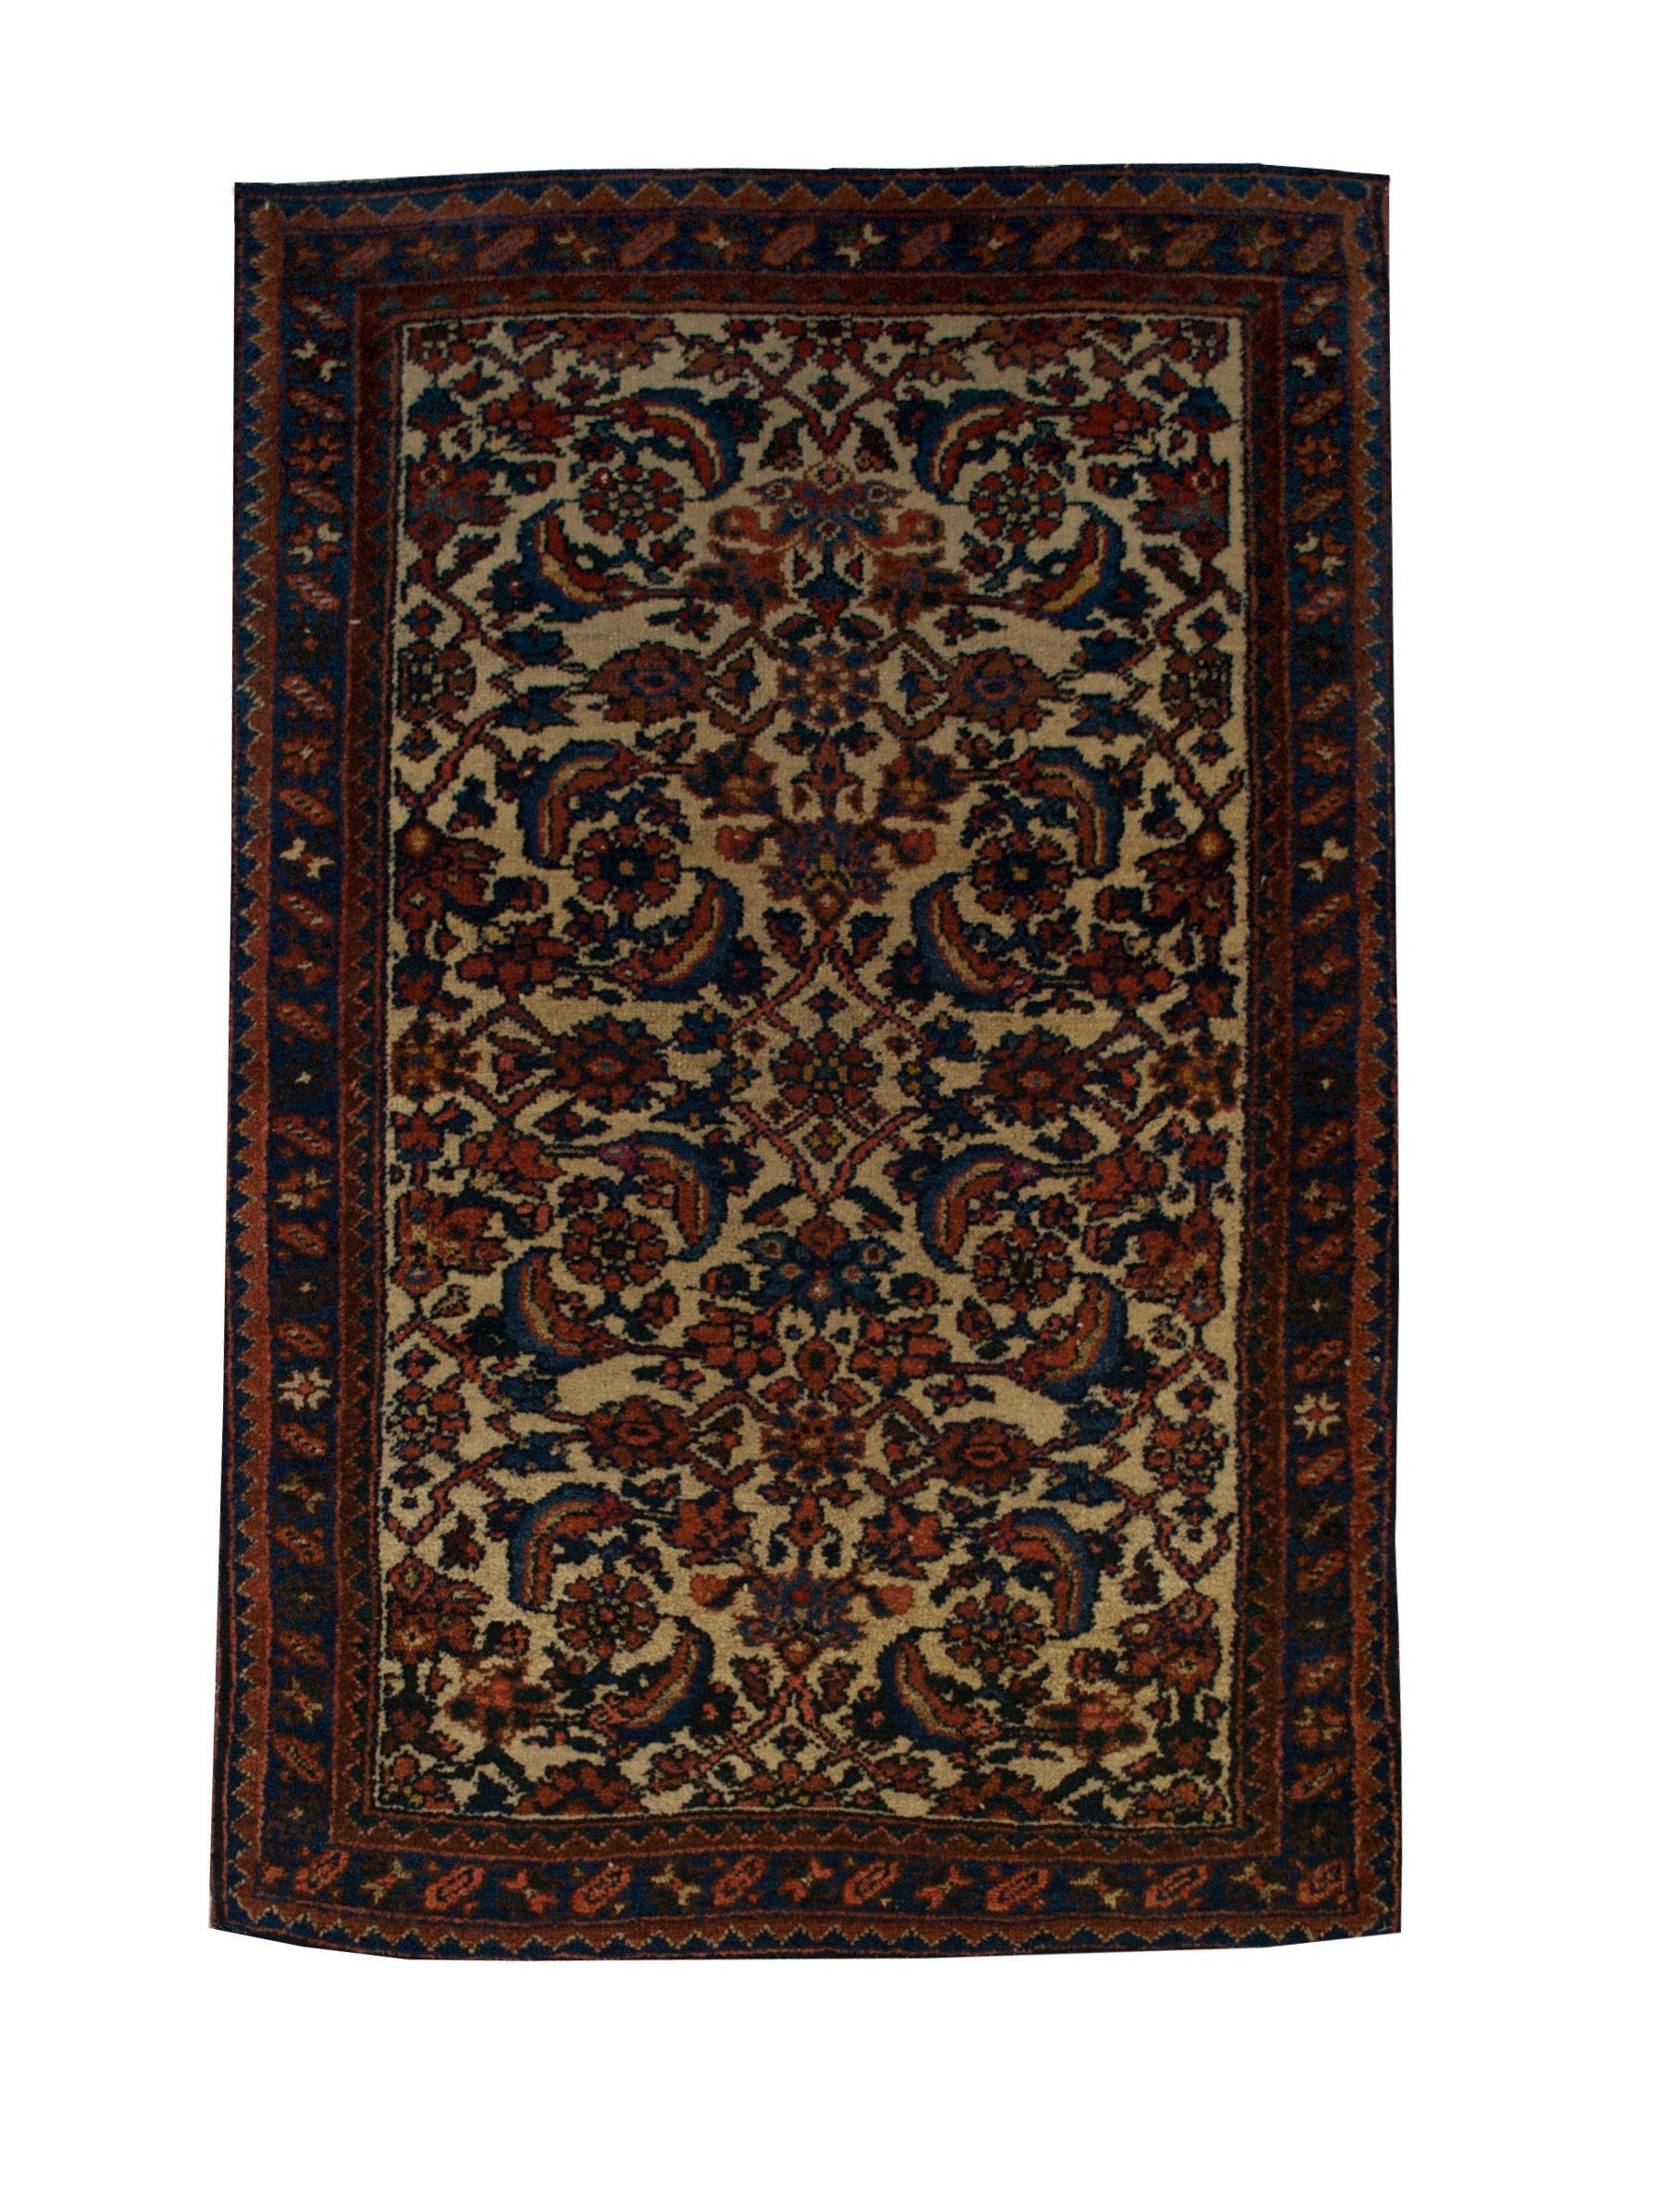 Antique Persian Hamadan Handmade Wool Area Rug - Shabahang Royal Carpet